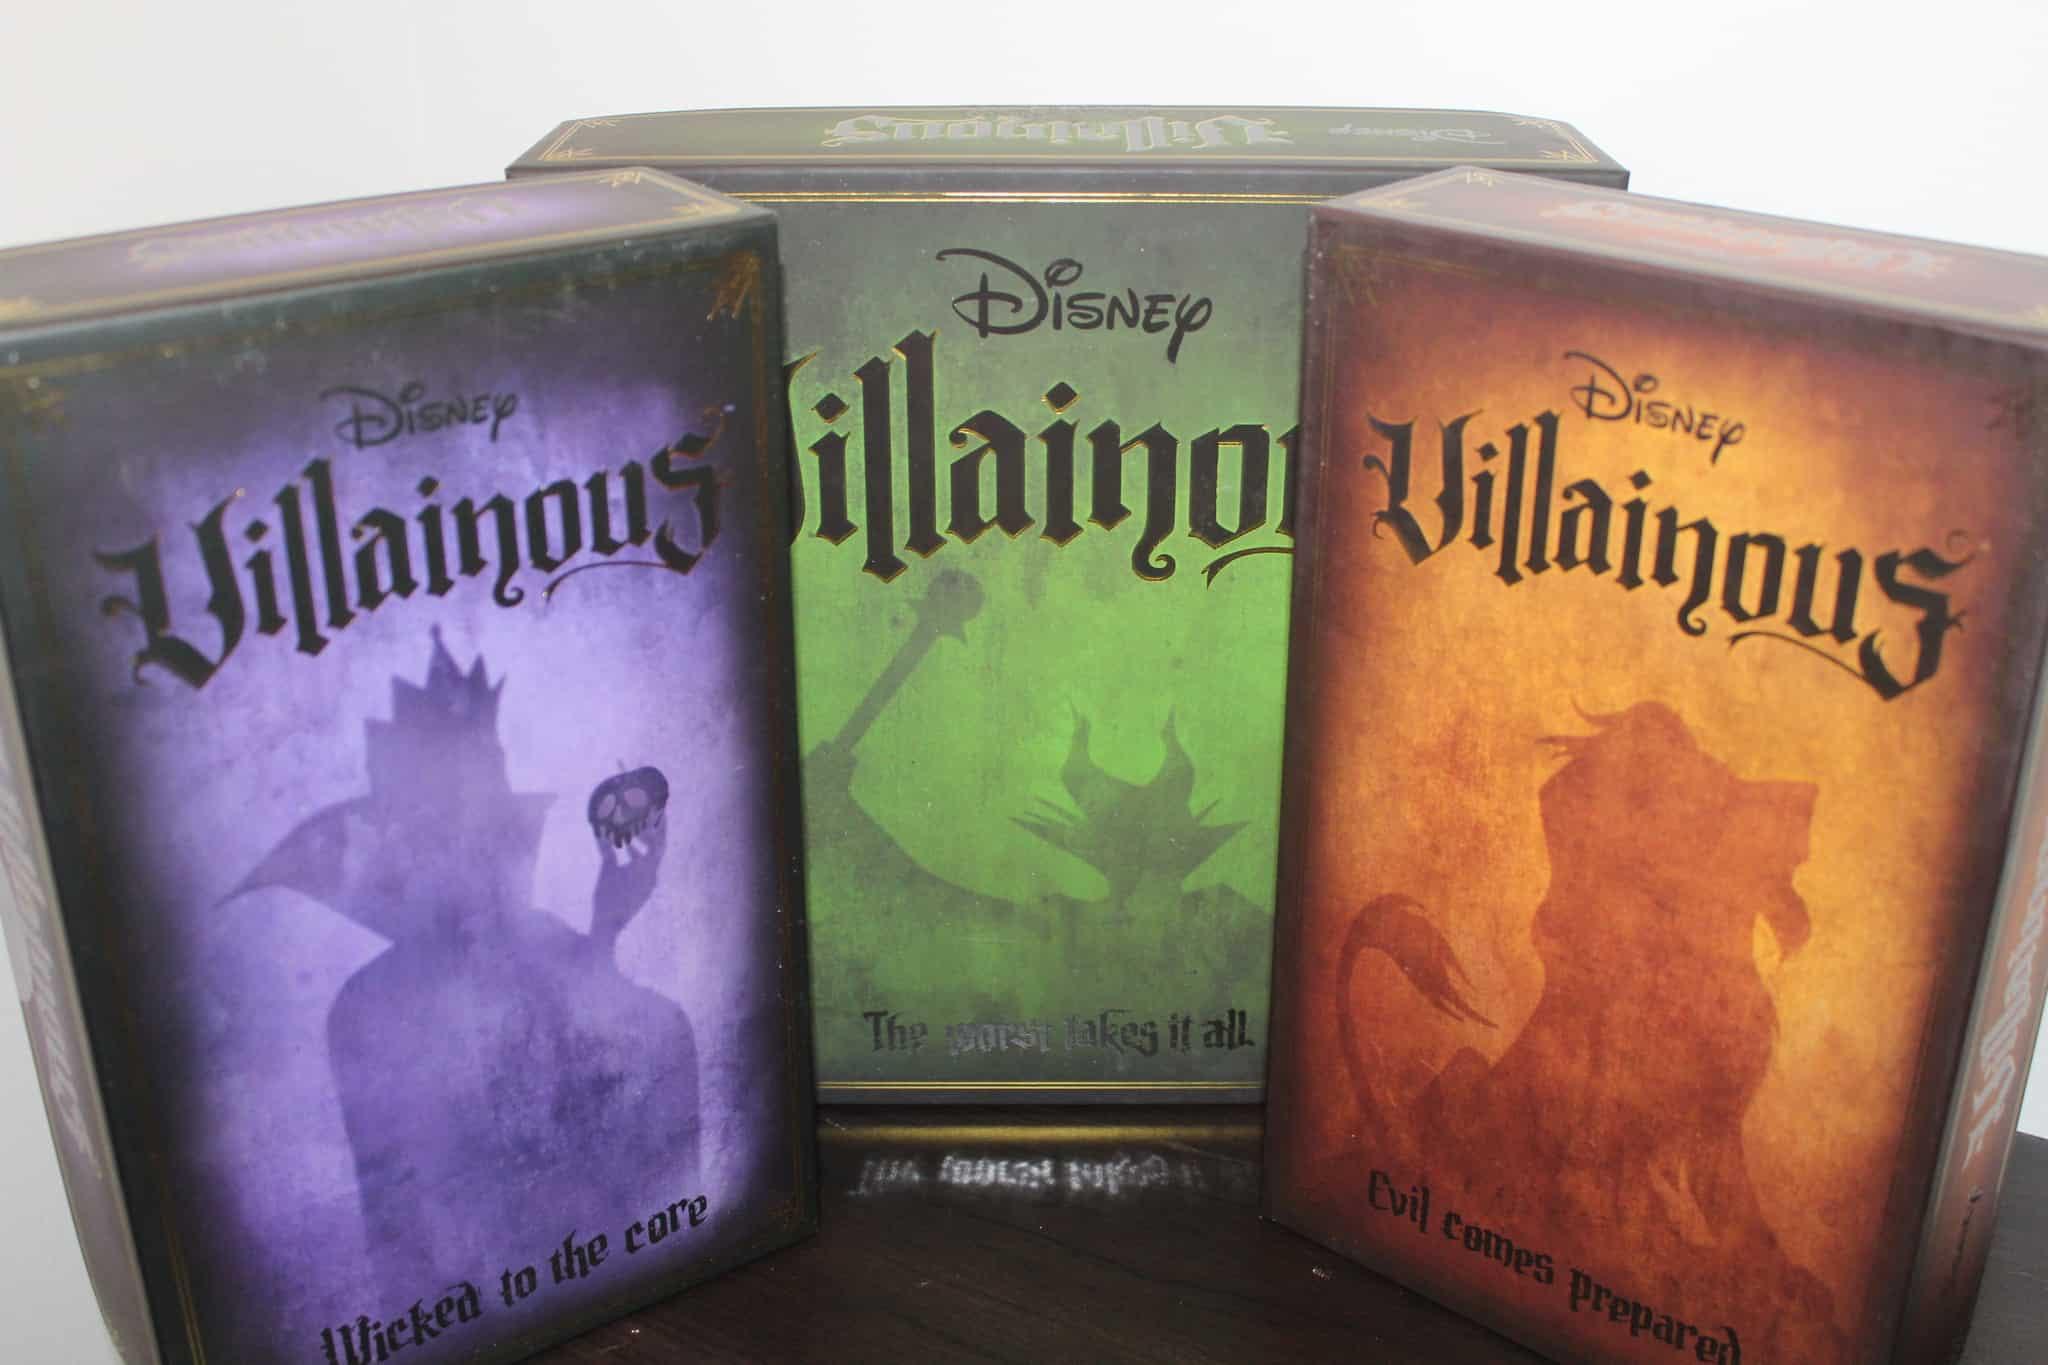 Game box, Evil Comes Prepared, Villainous